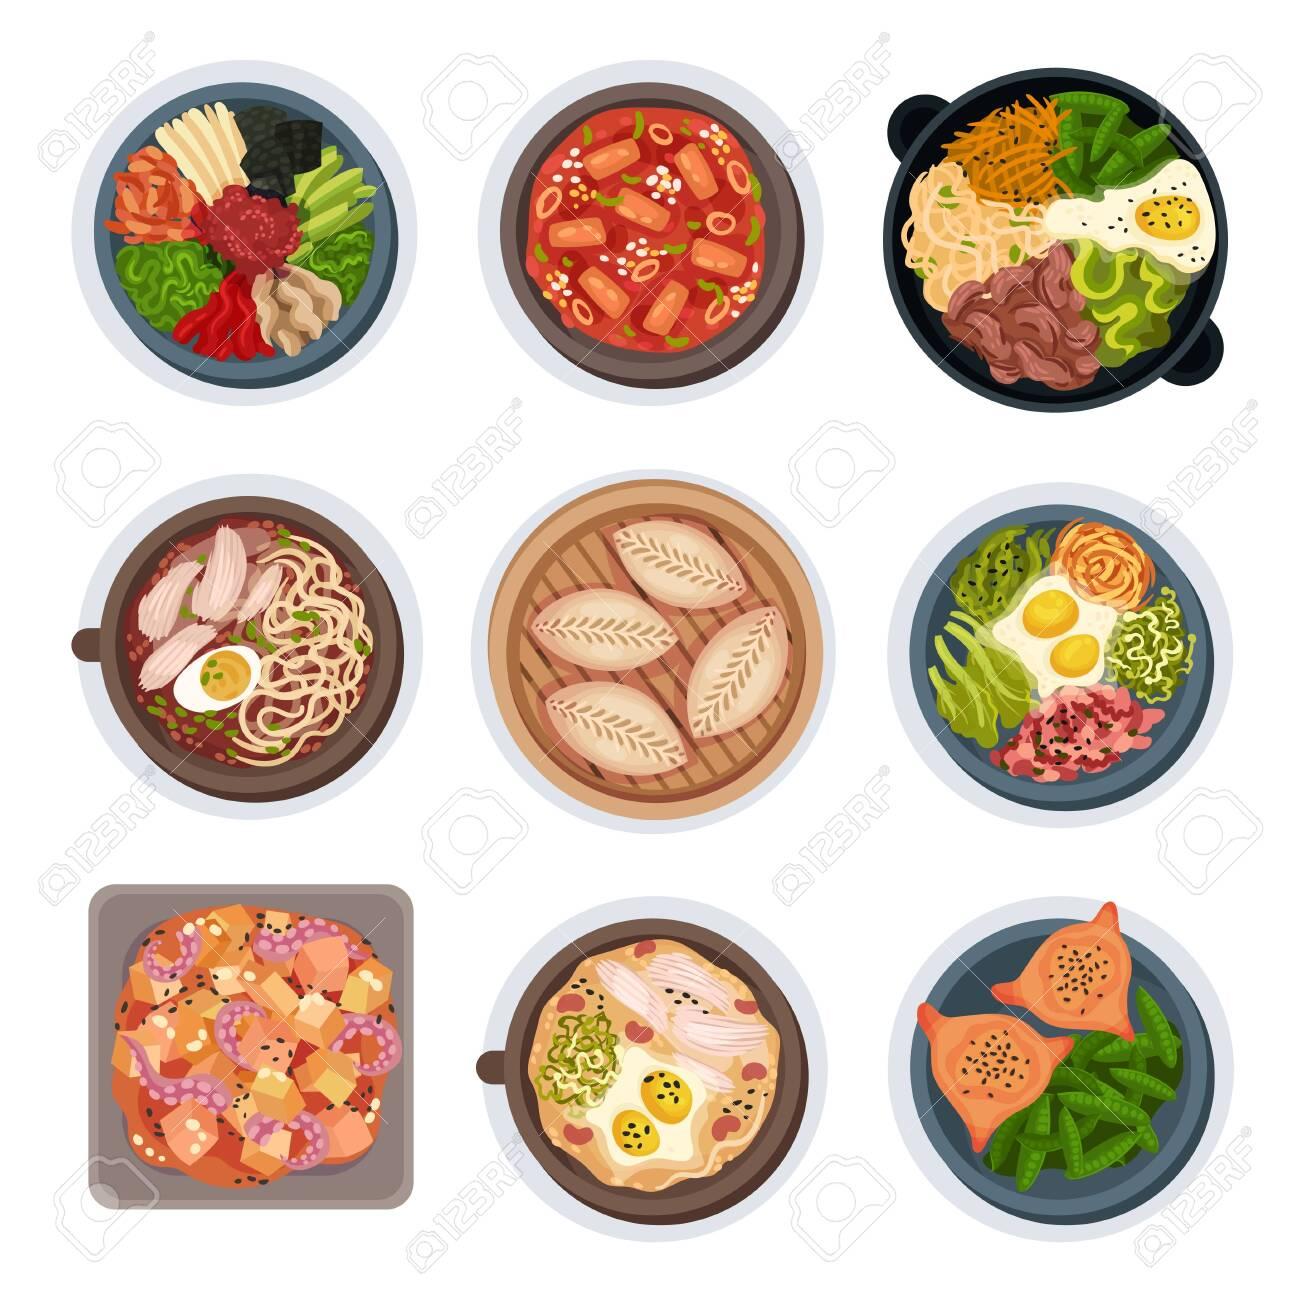 Korean Food Layouts Top View Vector Illustrations Set - 139410260